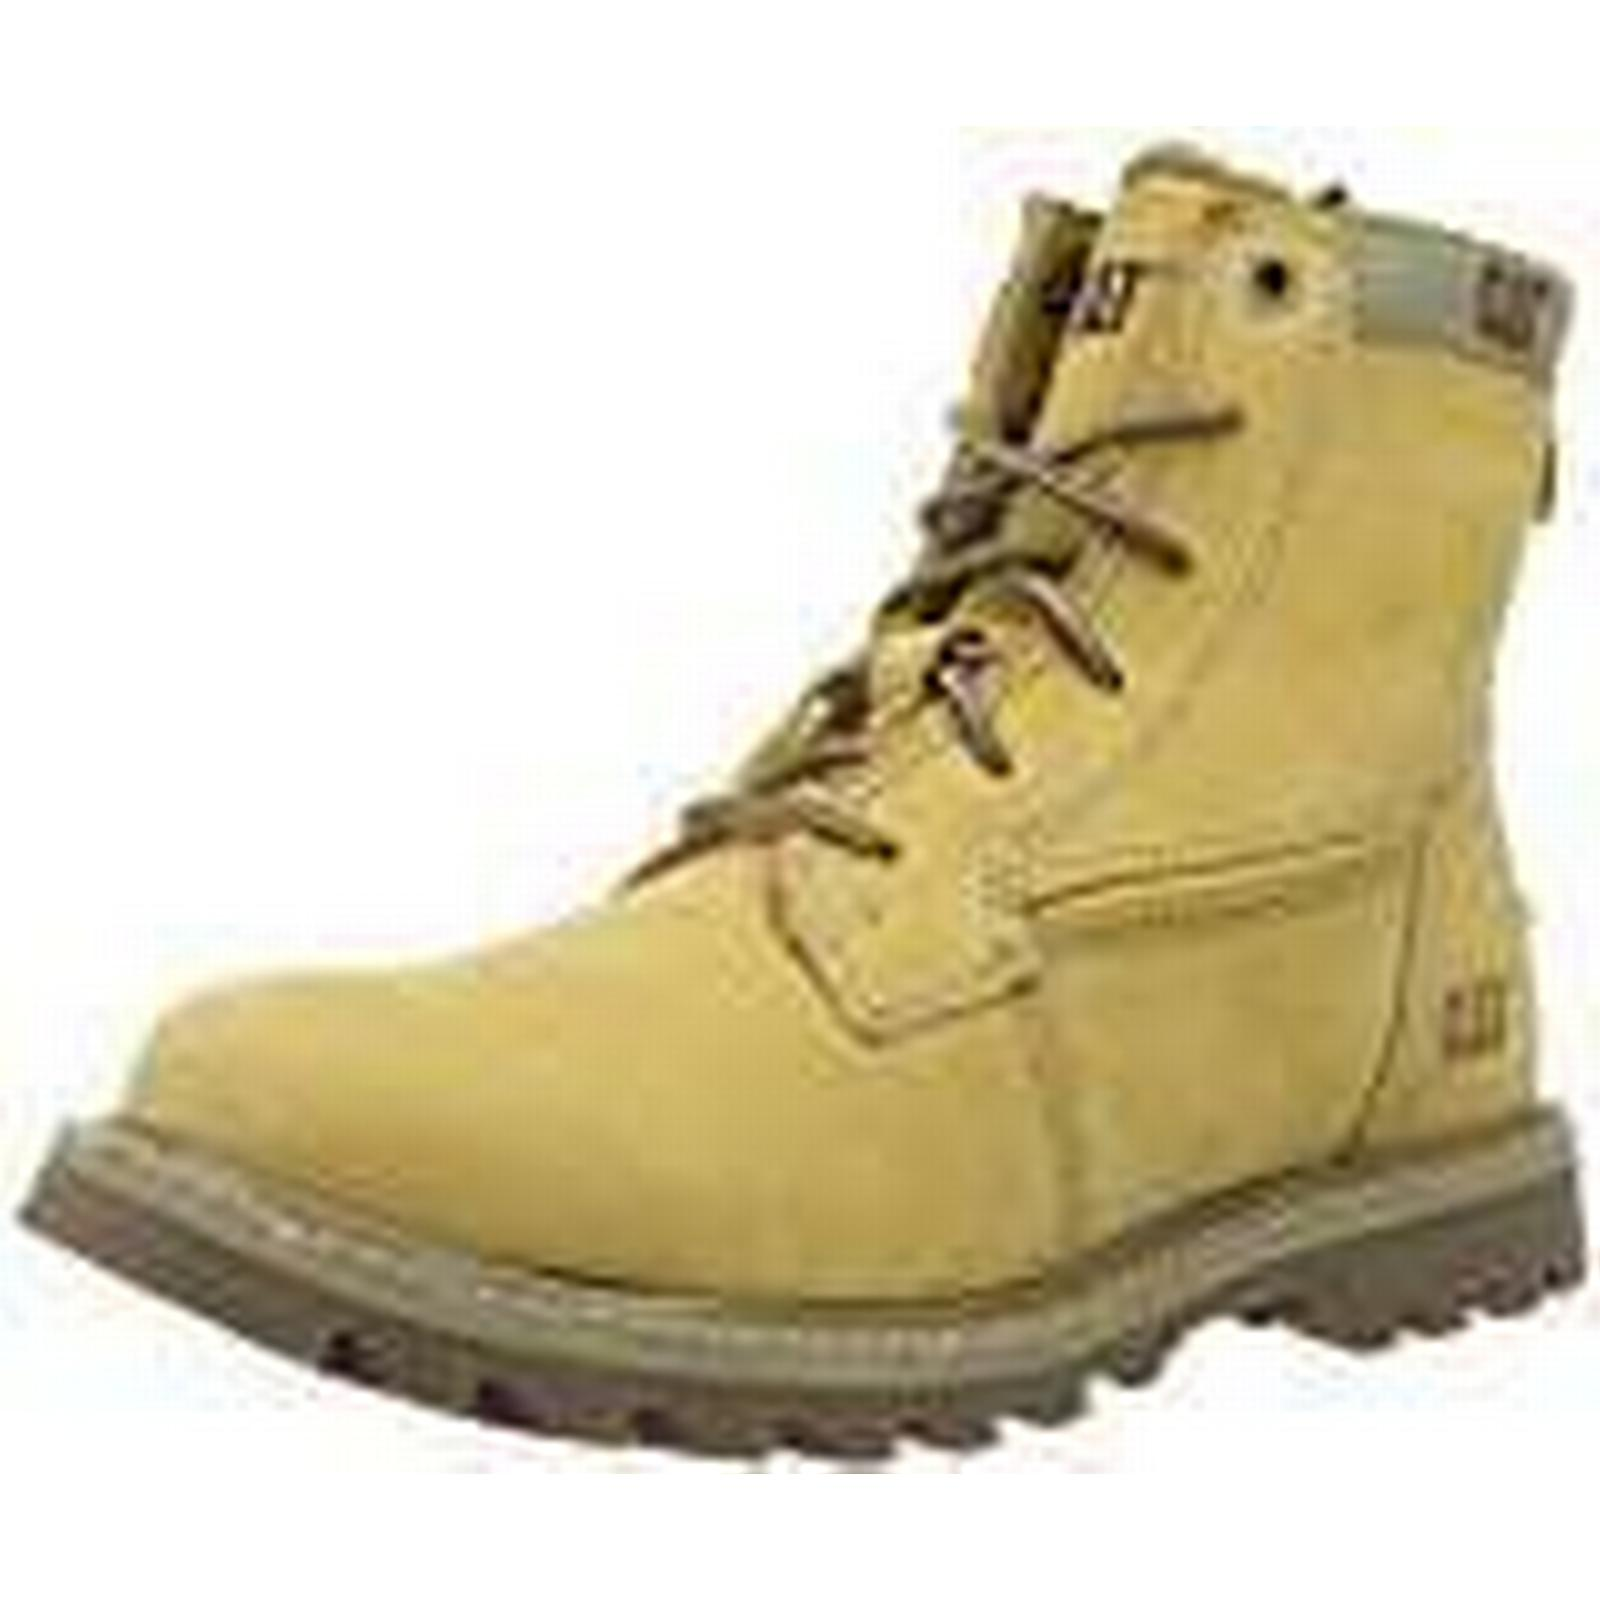 Caterpillar Cat Men's Swingshift Fur Ankle Boots, Brown (Honey EU Reset), 7 UK 41 EU (Honey f372b0